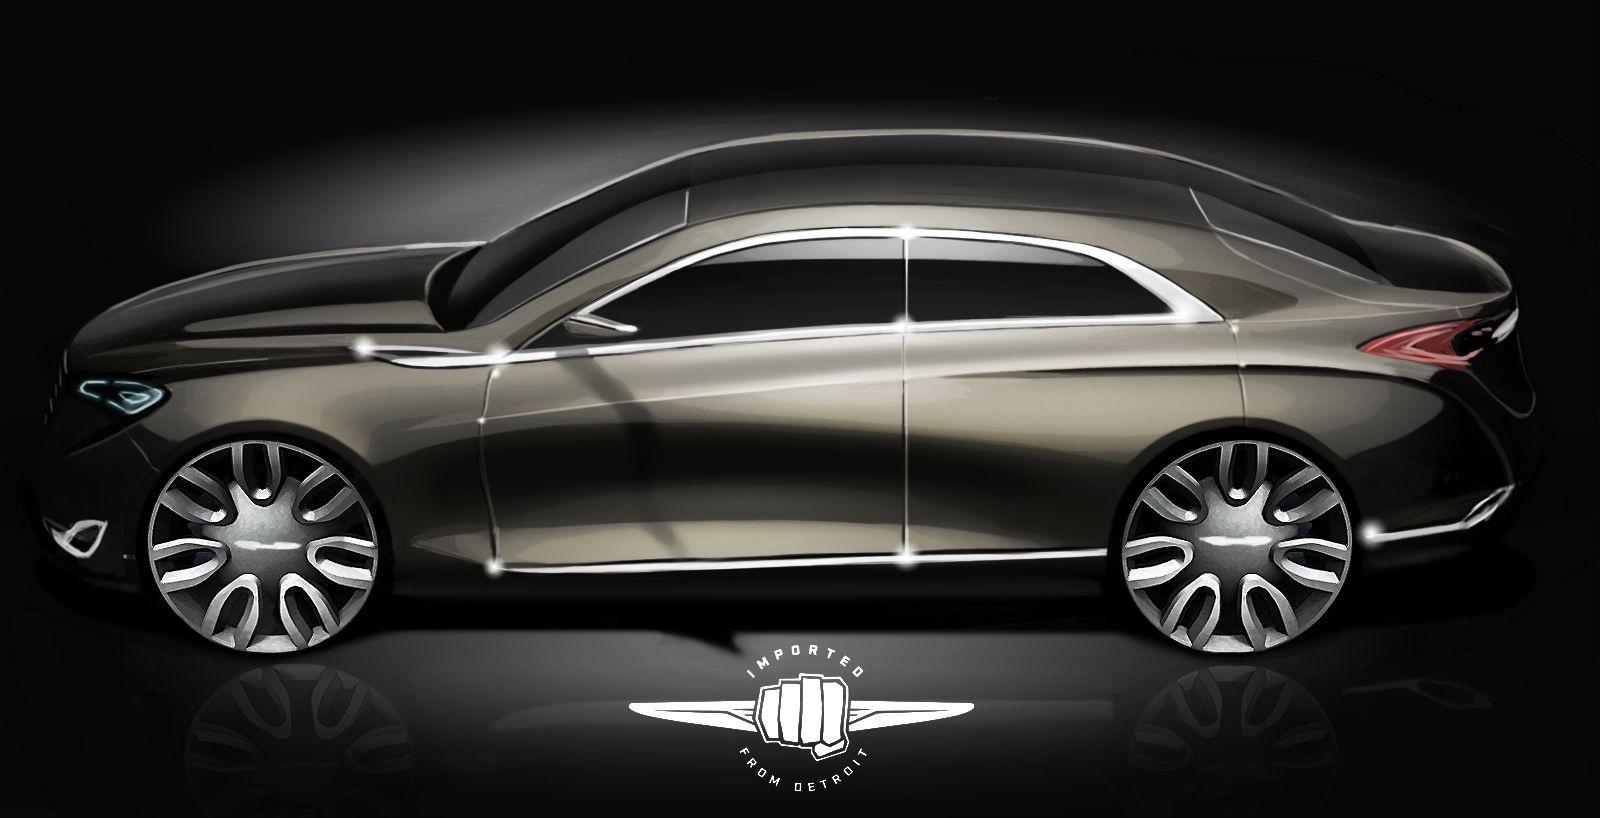 Next generation 2014 chrysler 200 sedan